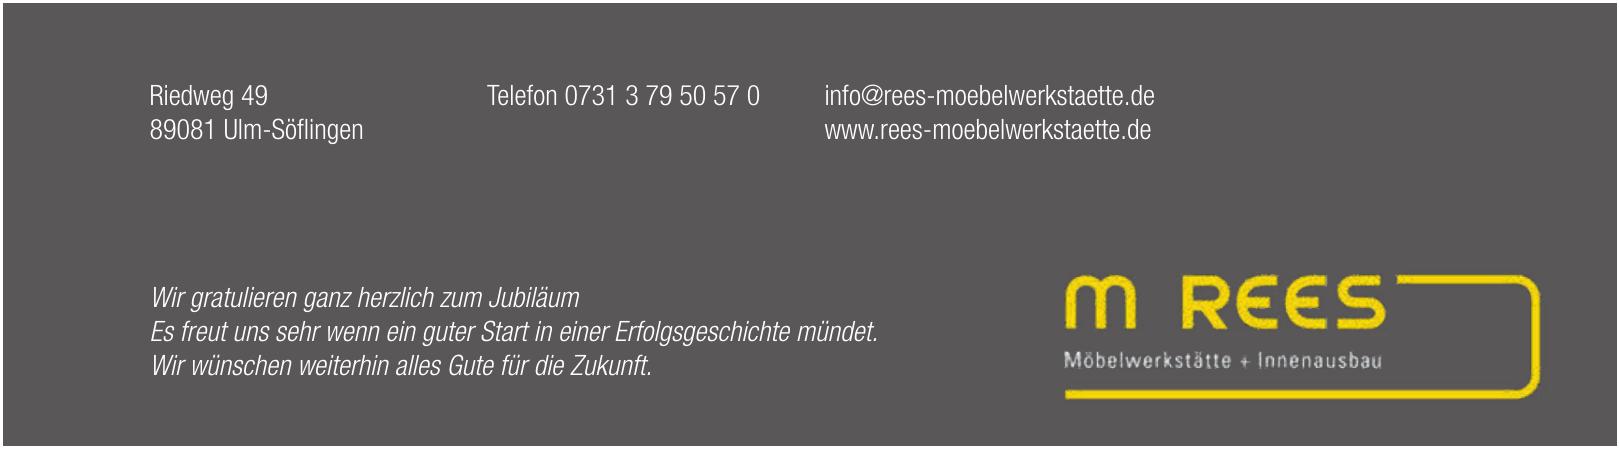 M. Rees - Möbelwerkstätte + Innenausbau